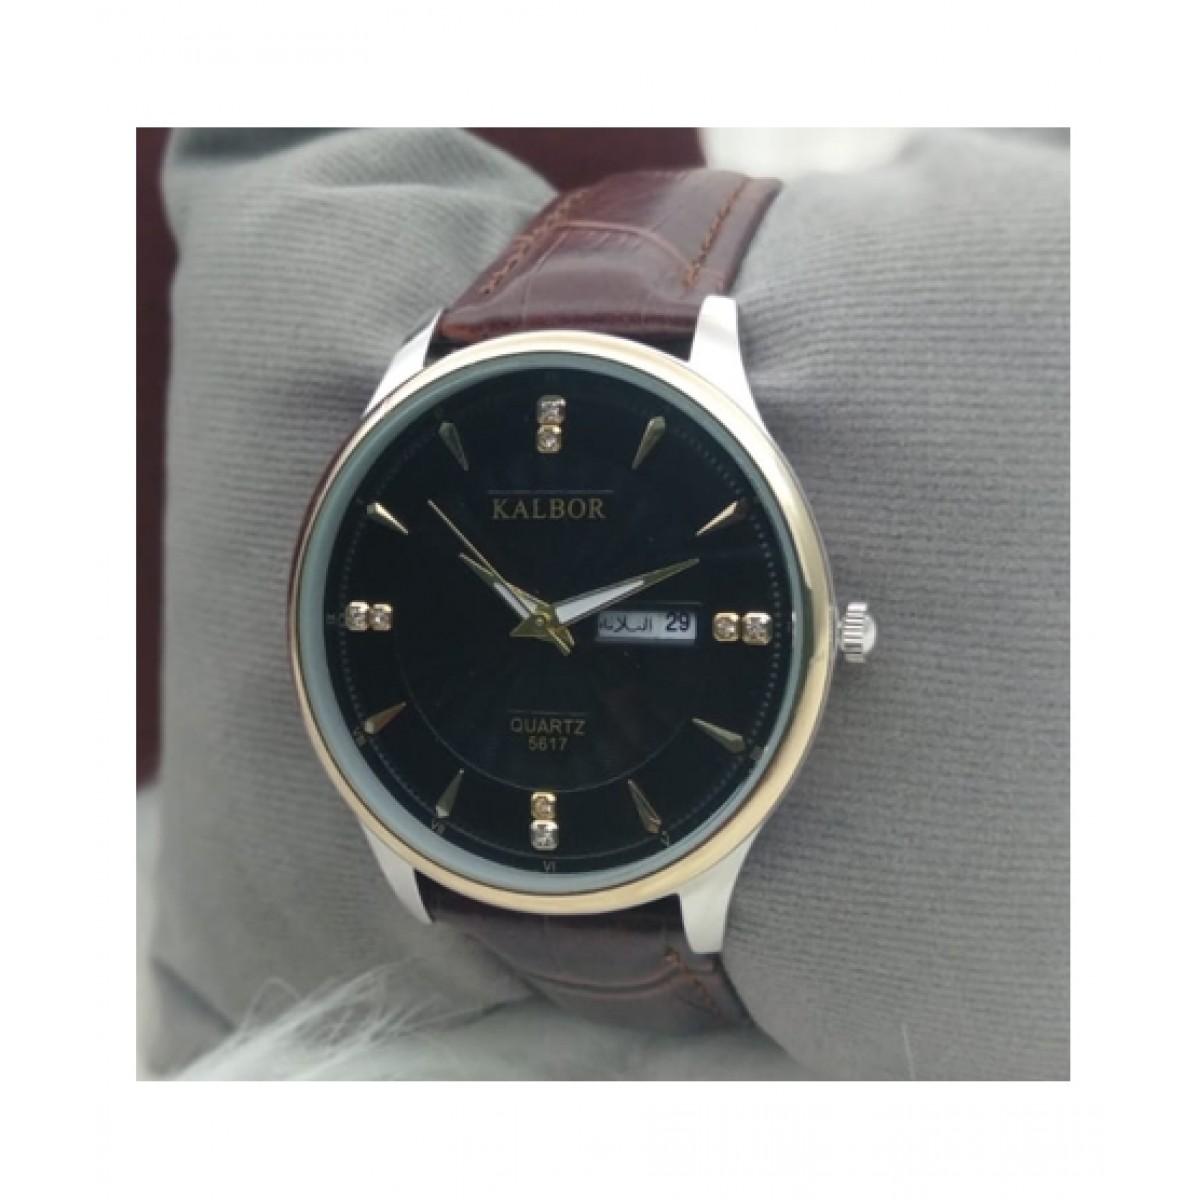 KK Accessories Kalbor Analog Watch For Men Brown (BGI1-0294)